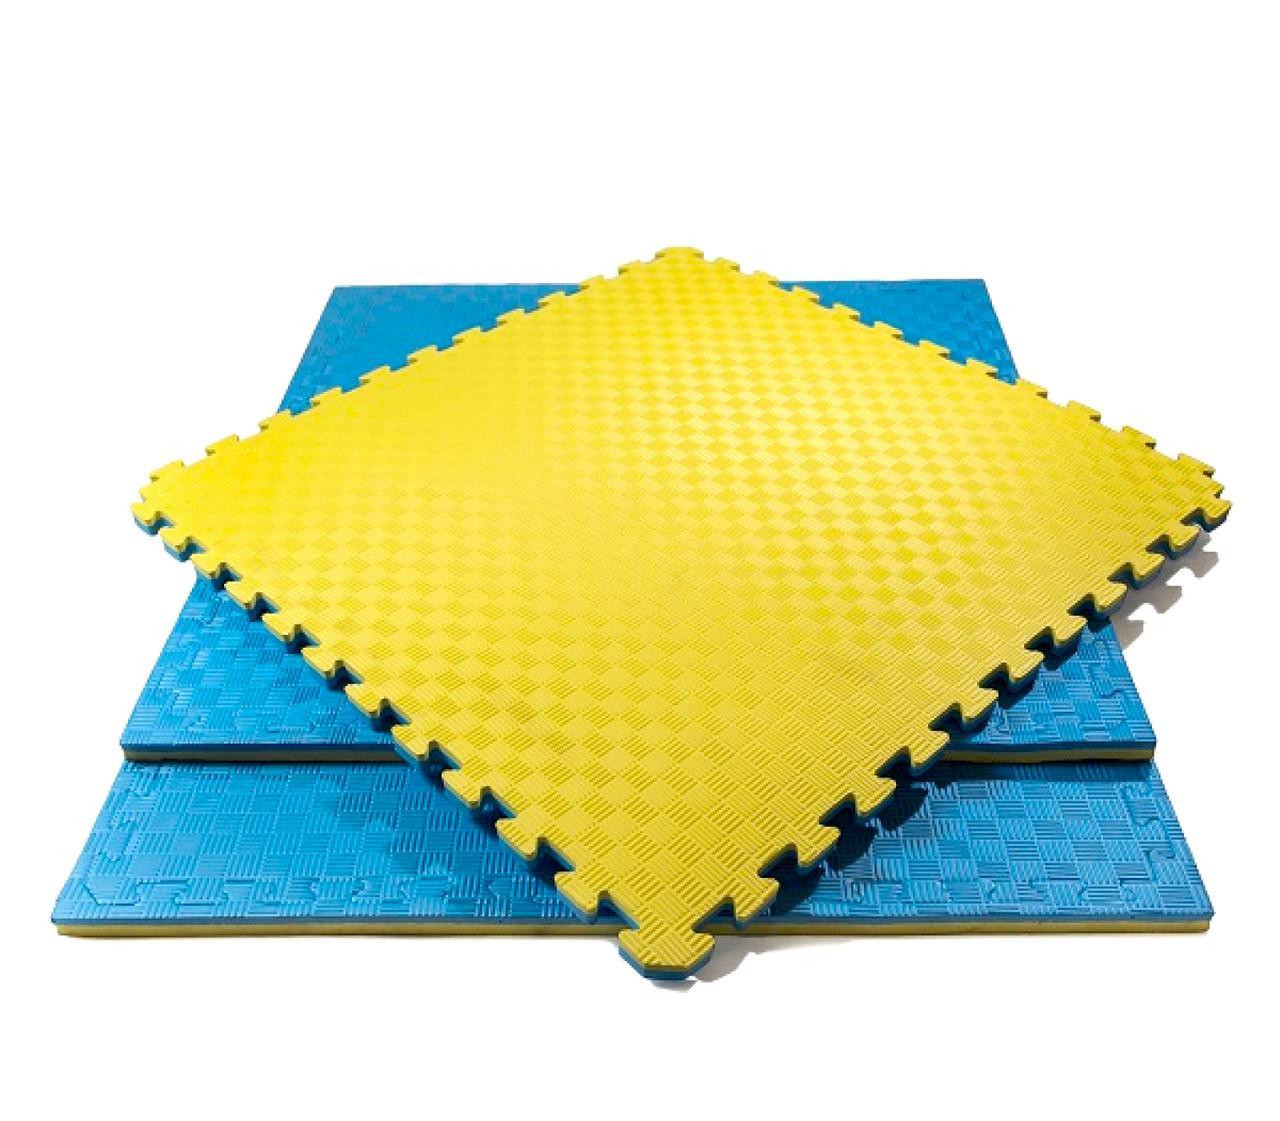 Cпортивный мат - татами «ласточкин хвост» SportMax (EVA 40мм, размер 1х1м, Турция)